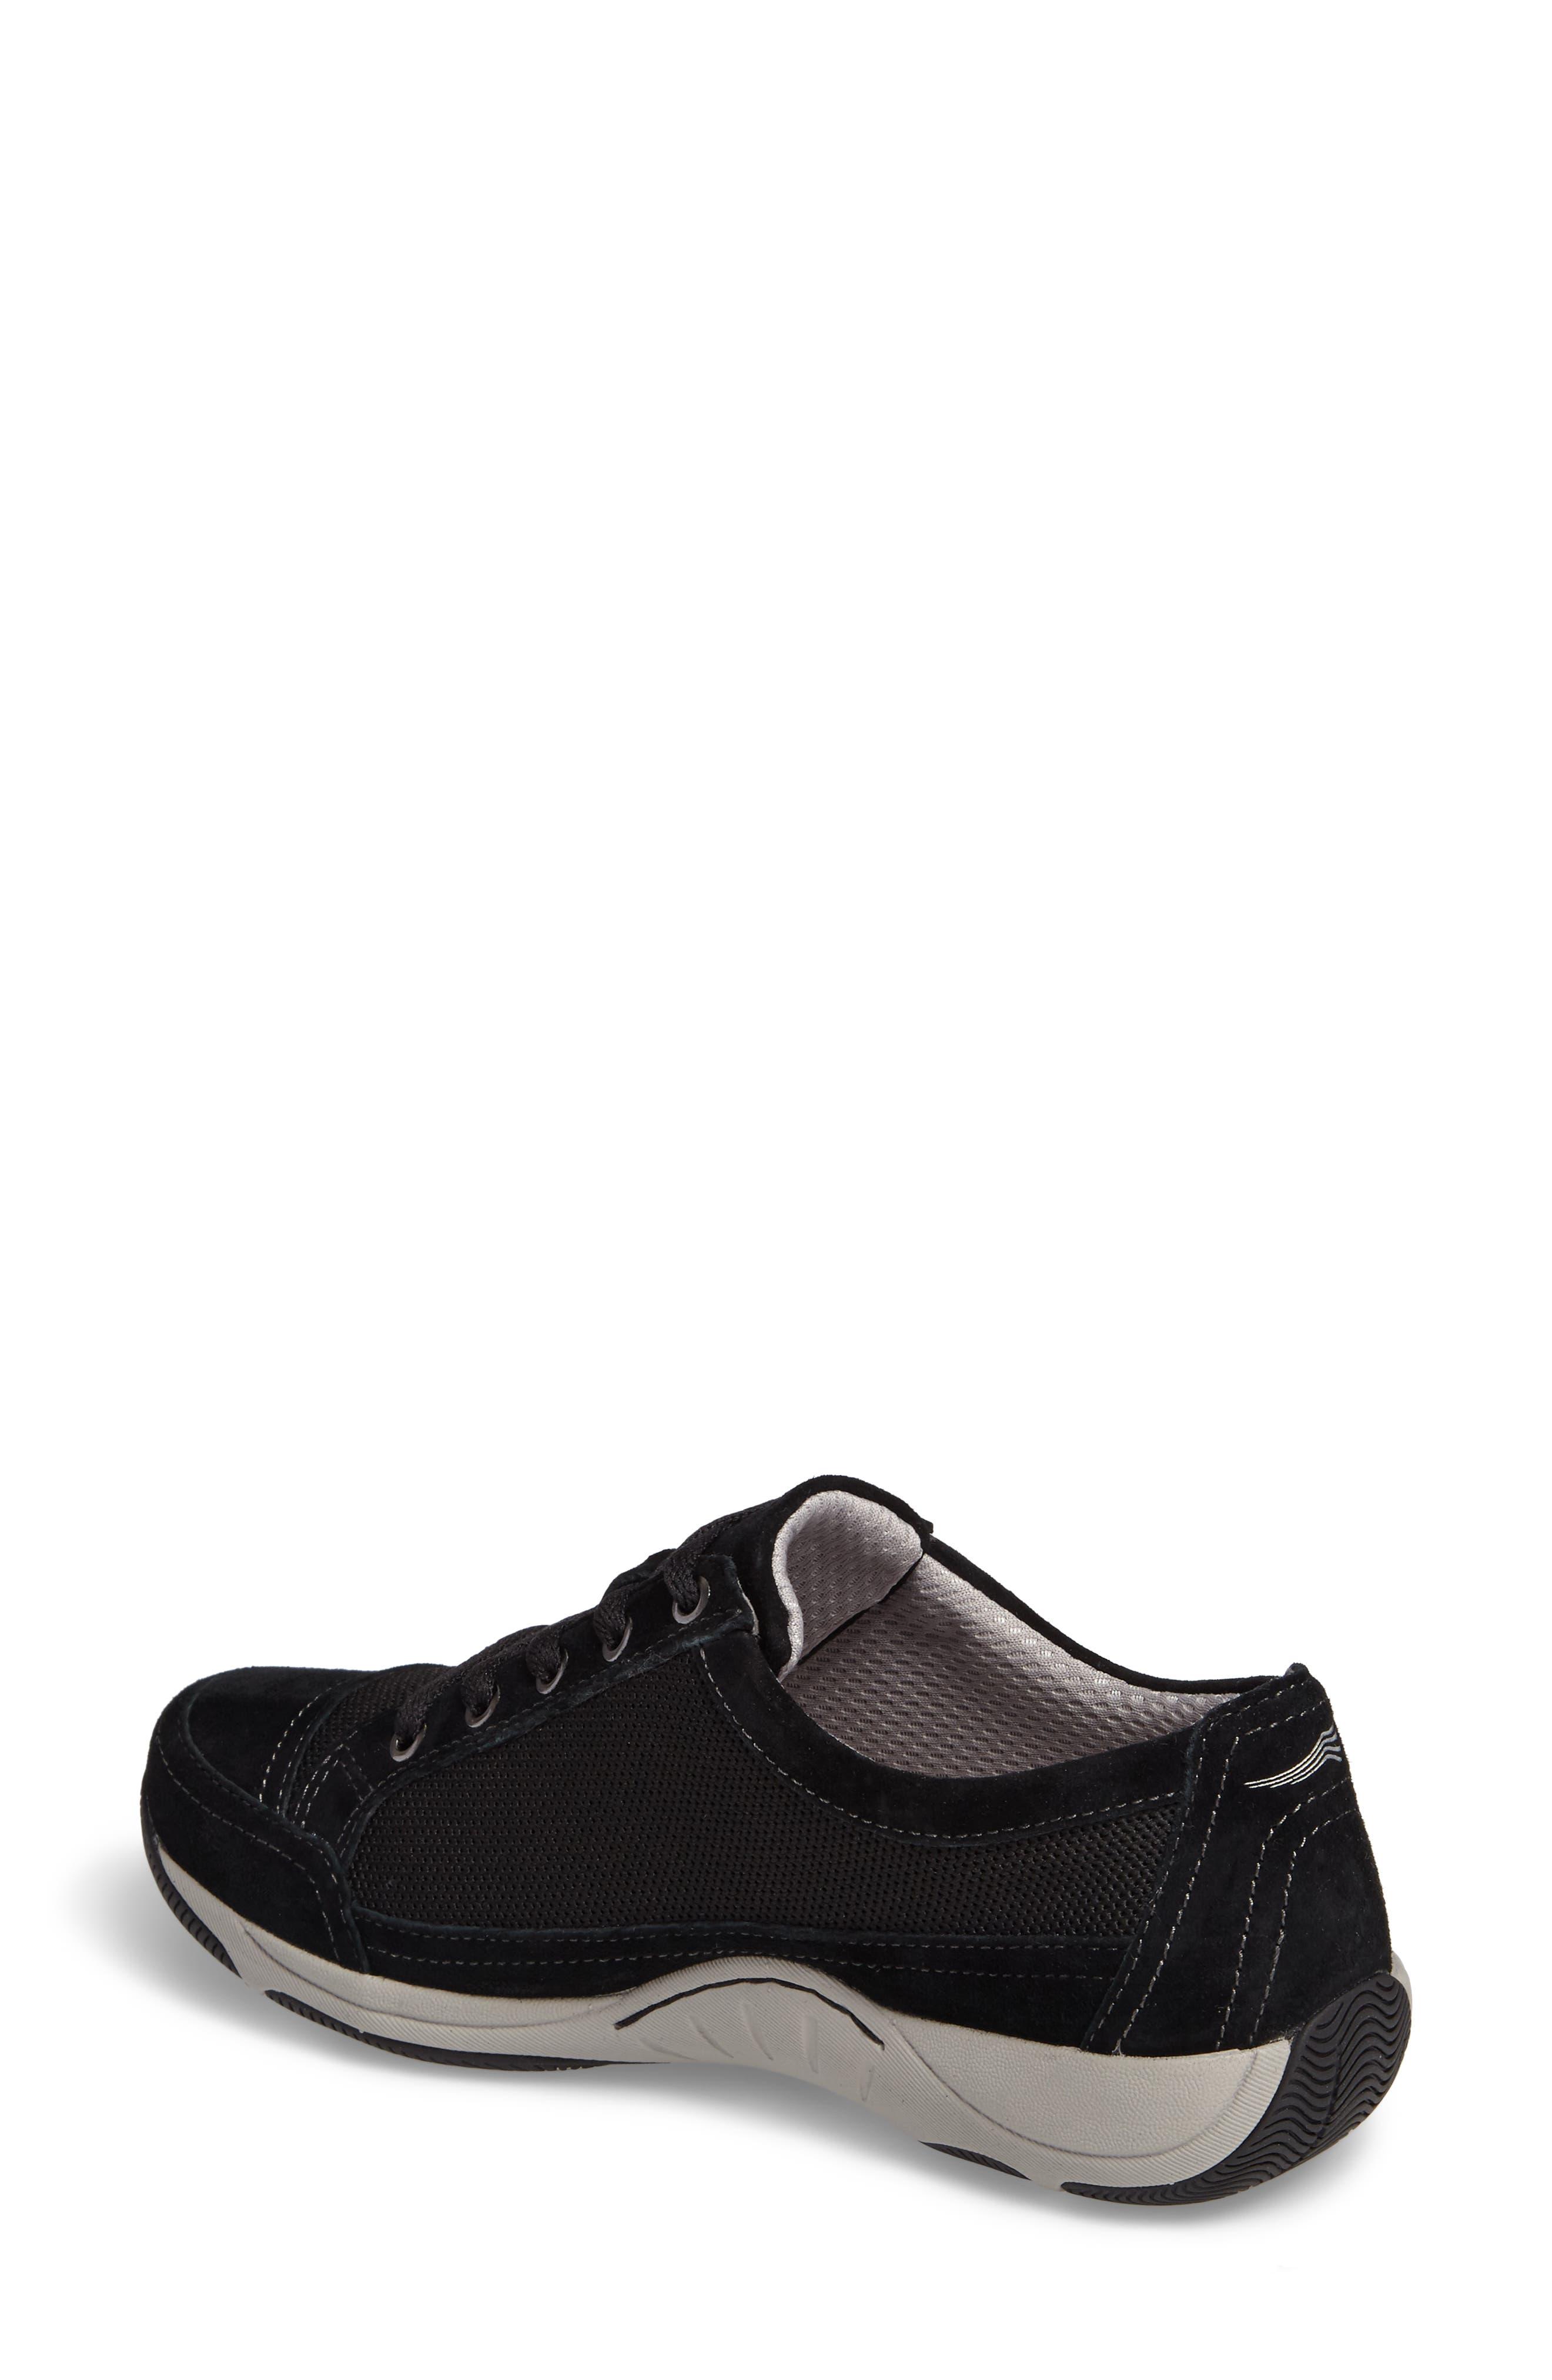 Harmony Sneaker,                             Alternate thumbnail 2, color,                             001